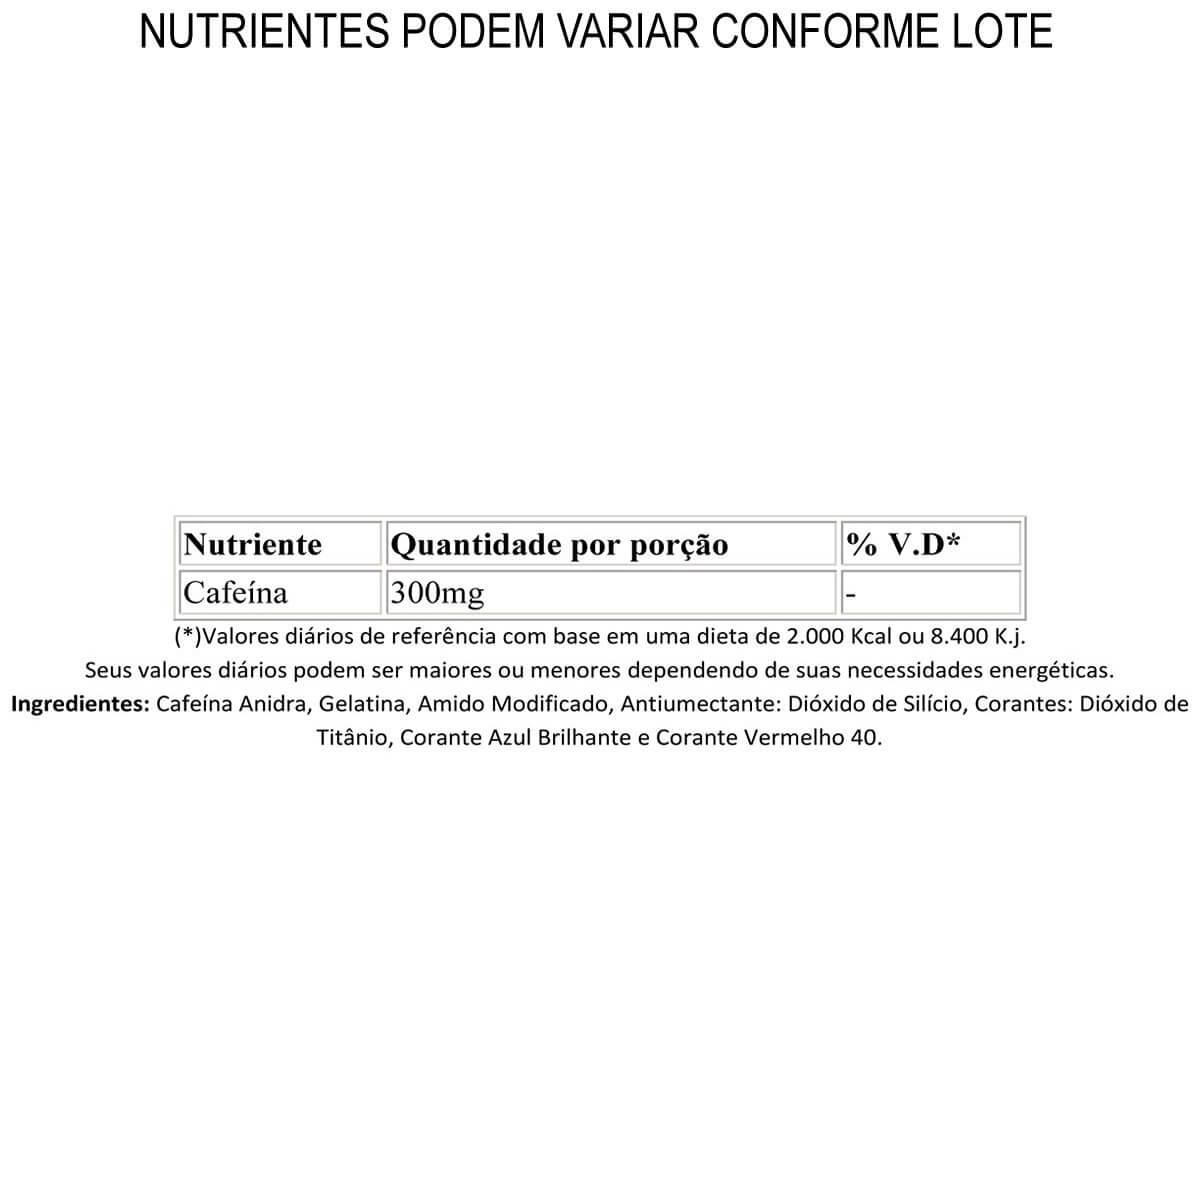 OxyElite Pro USPLabs (NACIONAL) - 60 caps